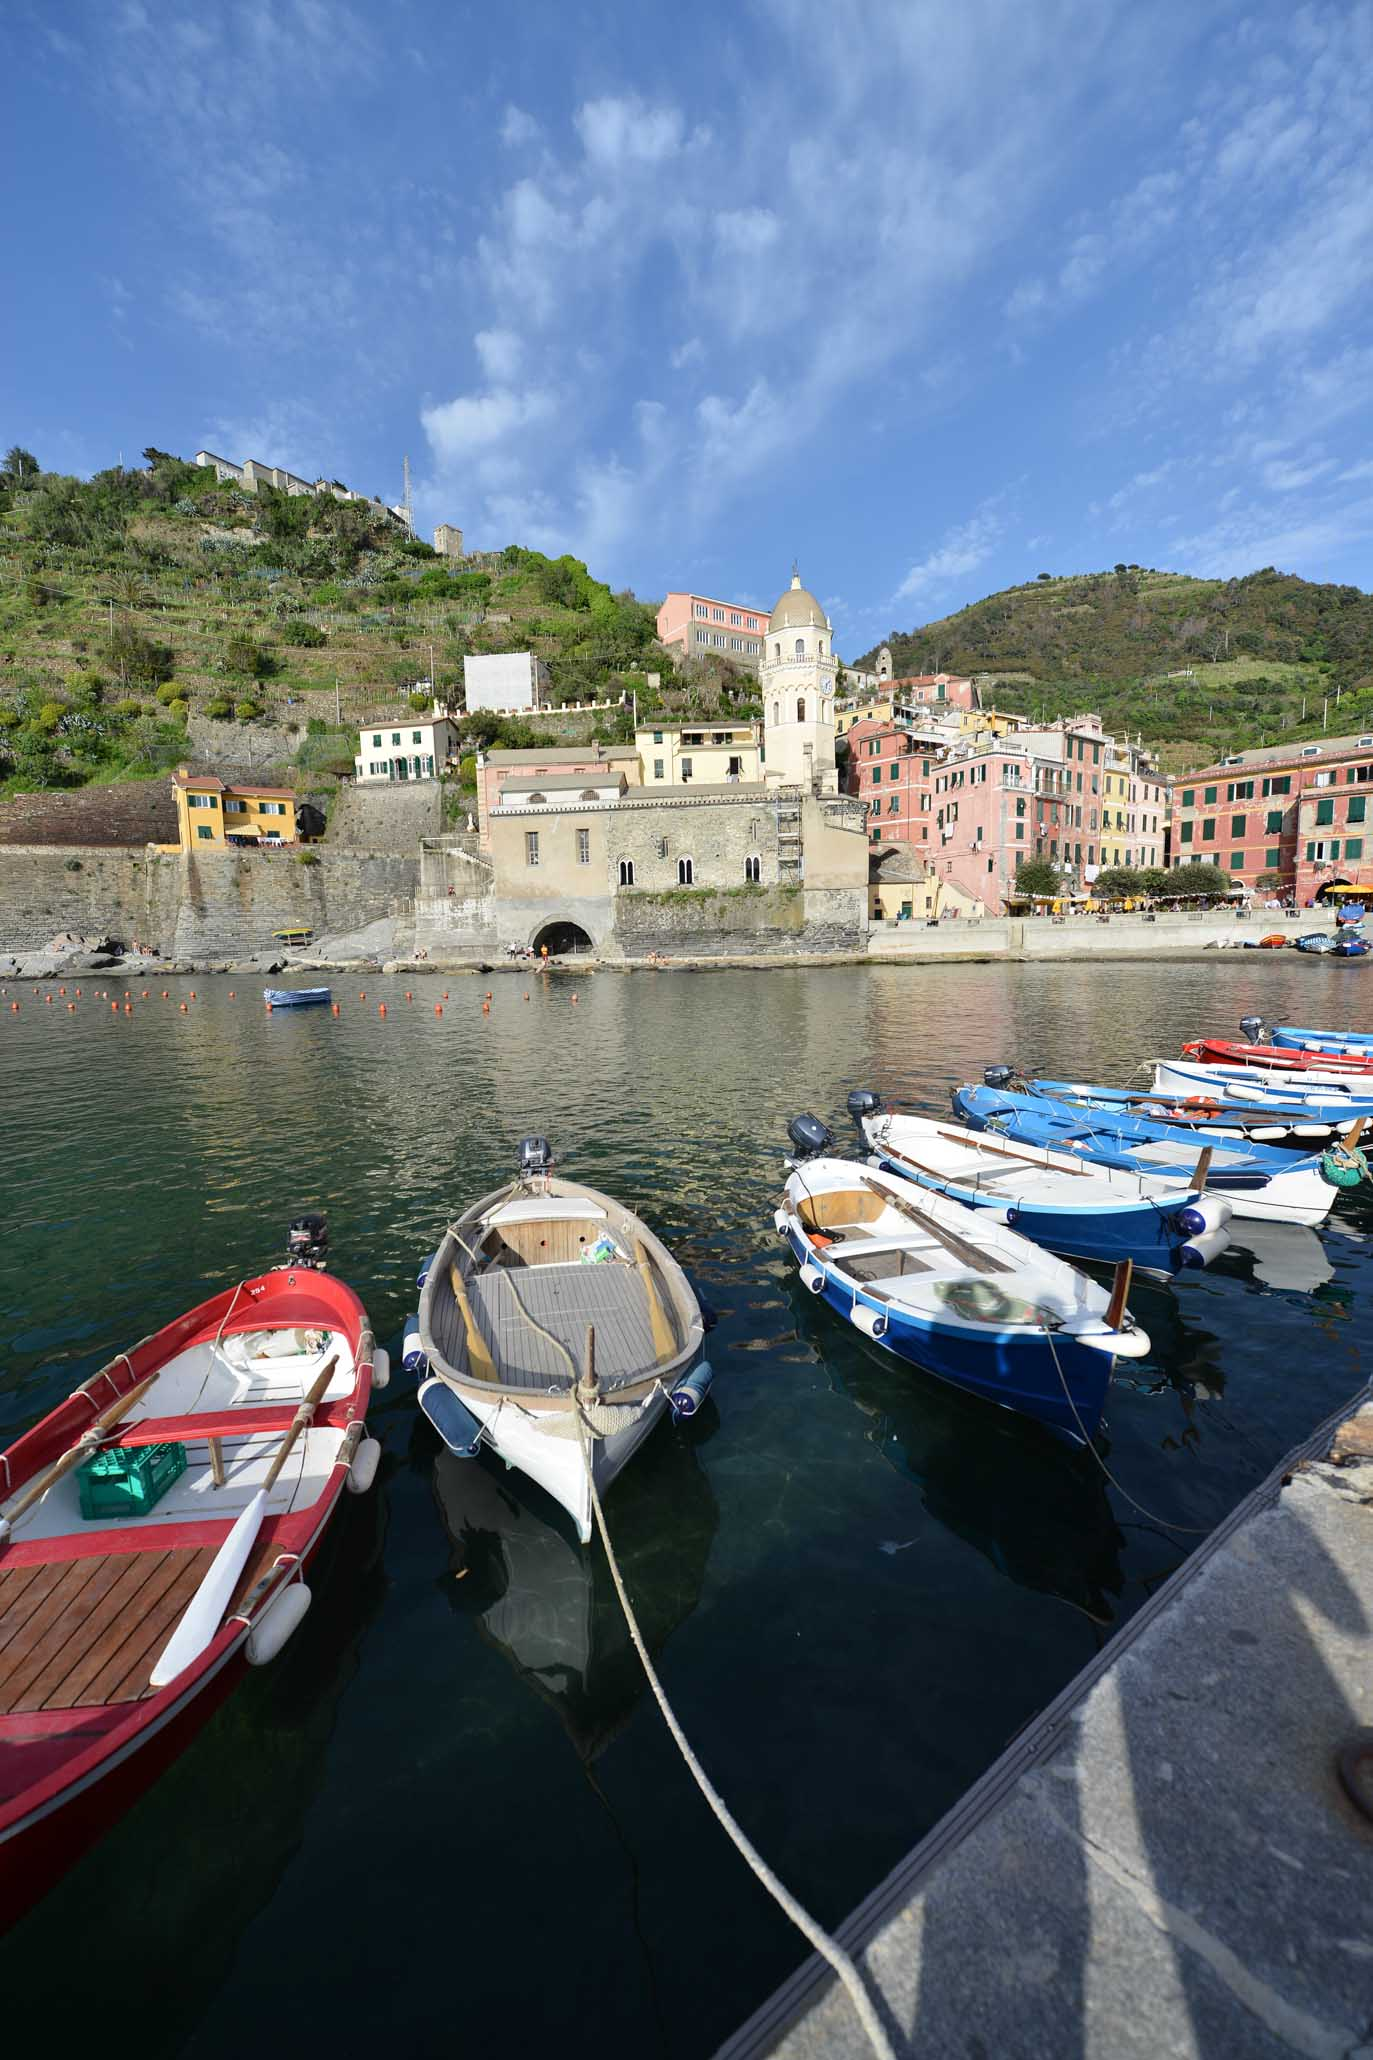 Cinque Terre, Liguria Italy boats, vernazza